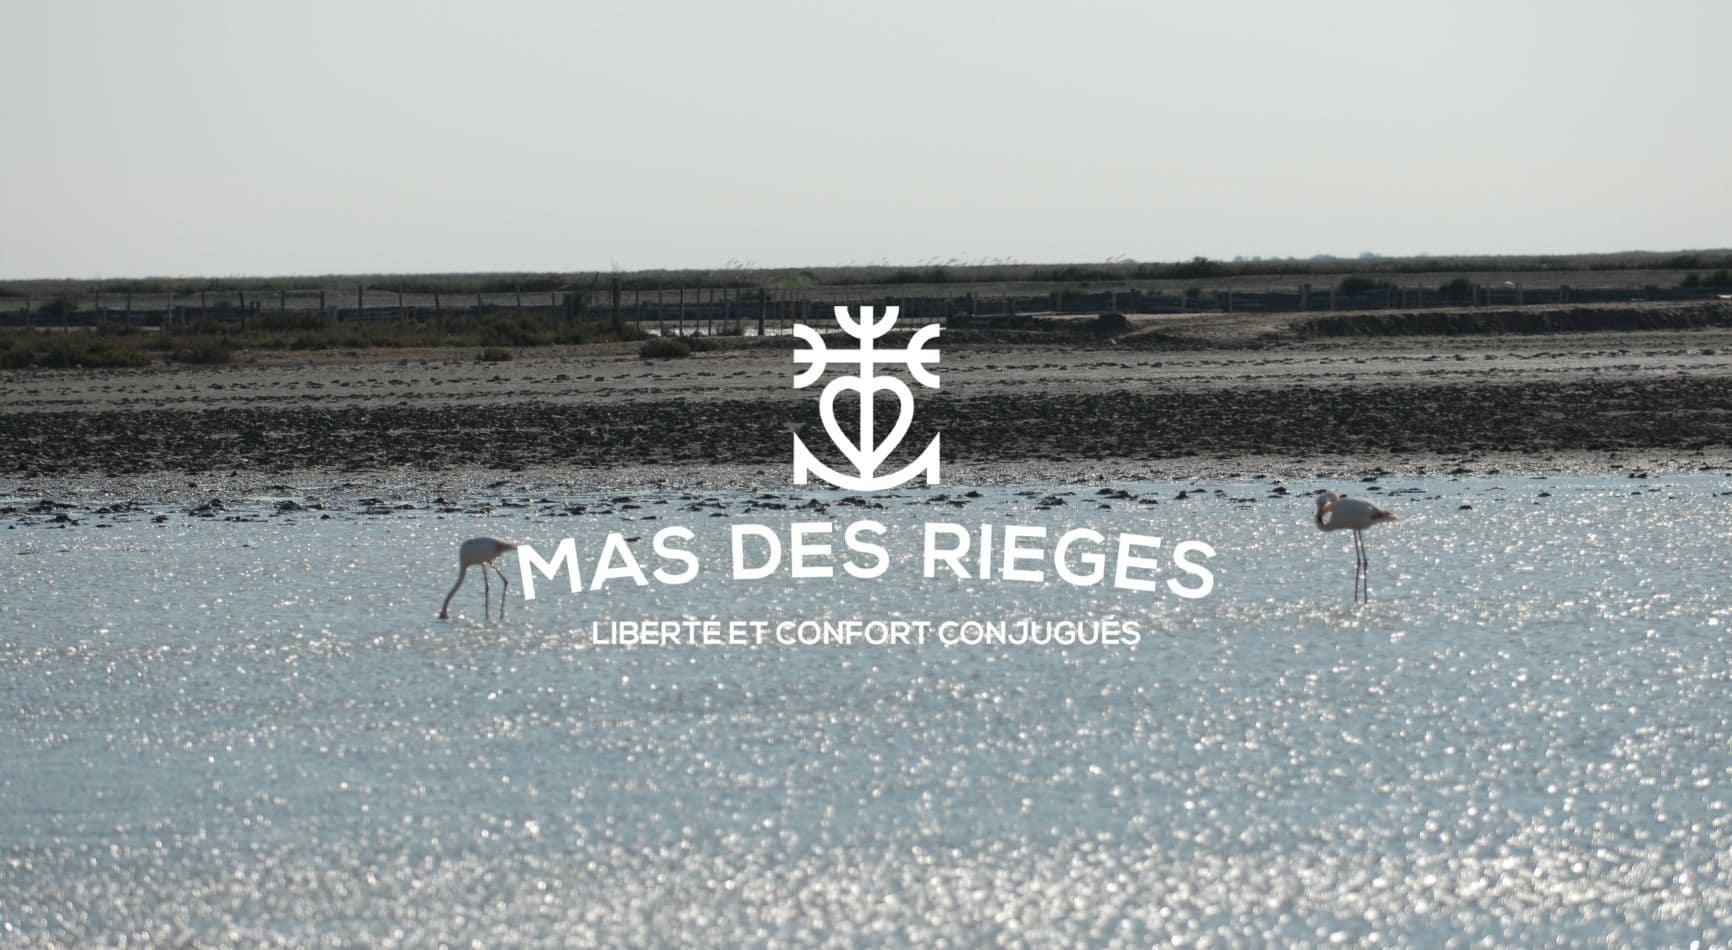 Flamants roses en Camargue